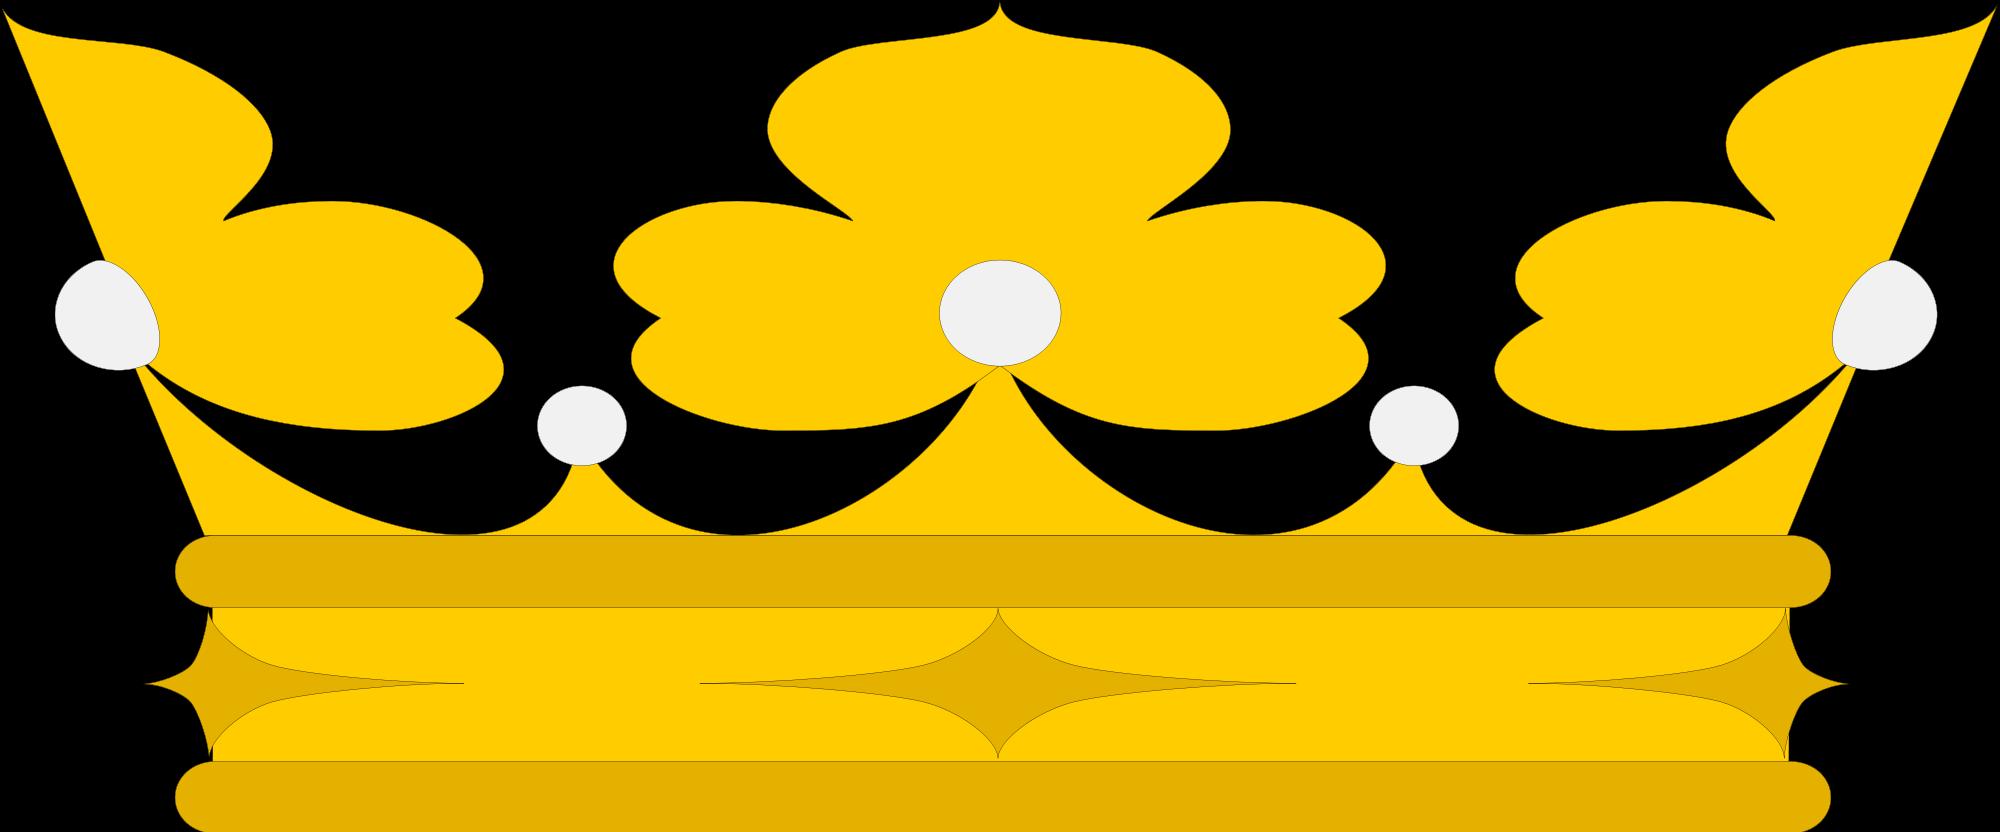 Open PlusPng.com  - Korona PNG